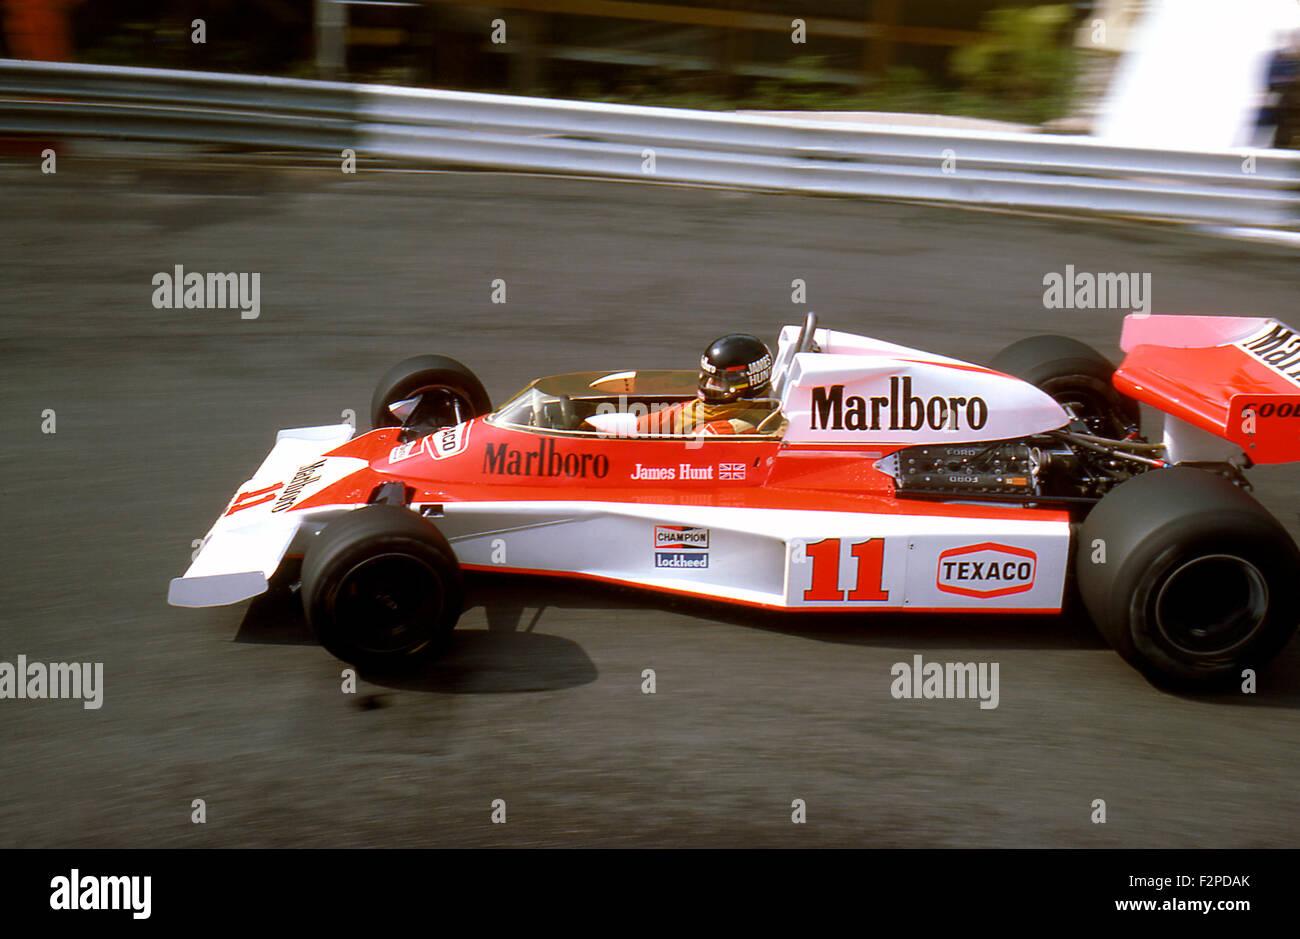 When Is The Monte Carlo Monaco Car Race